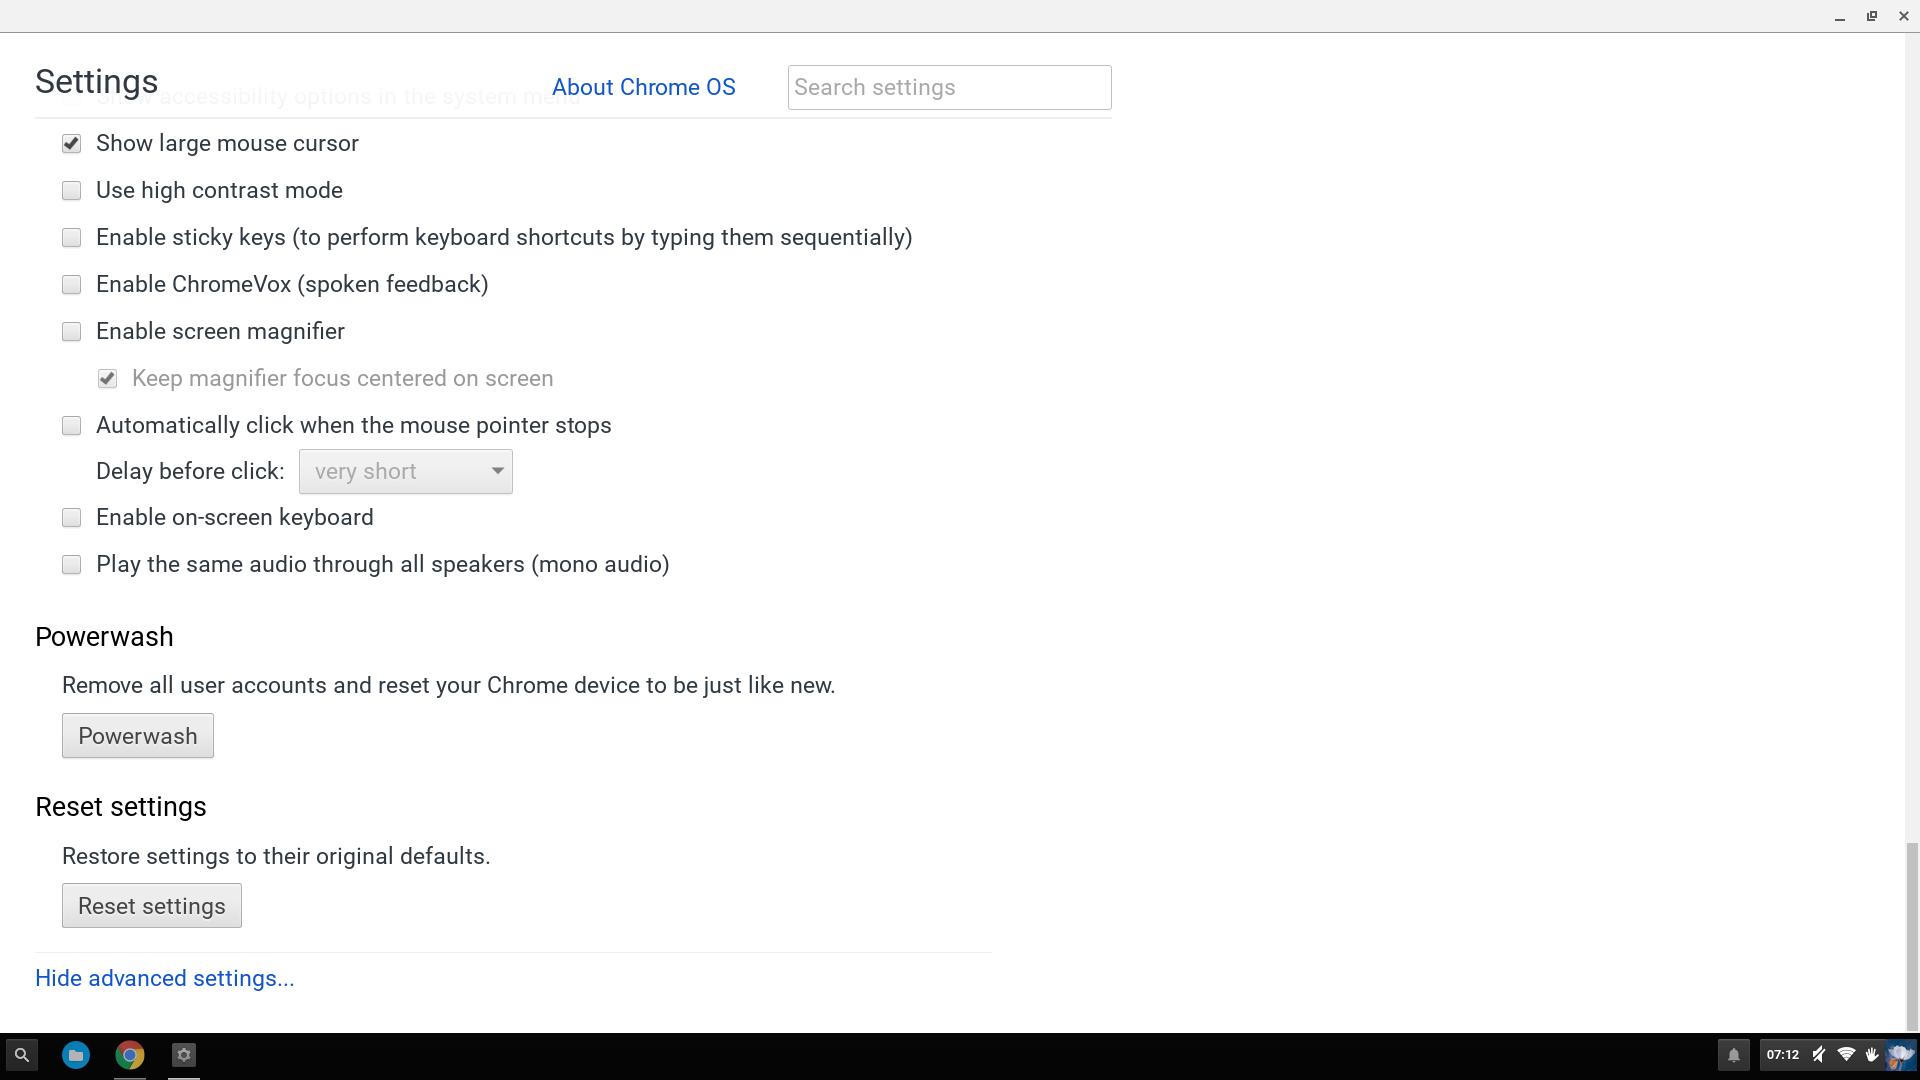 Does Chromebox have Powerwash? - Chromebook Help